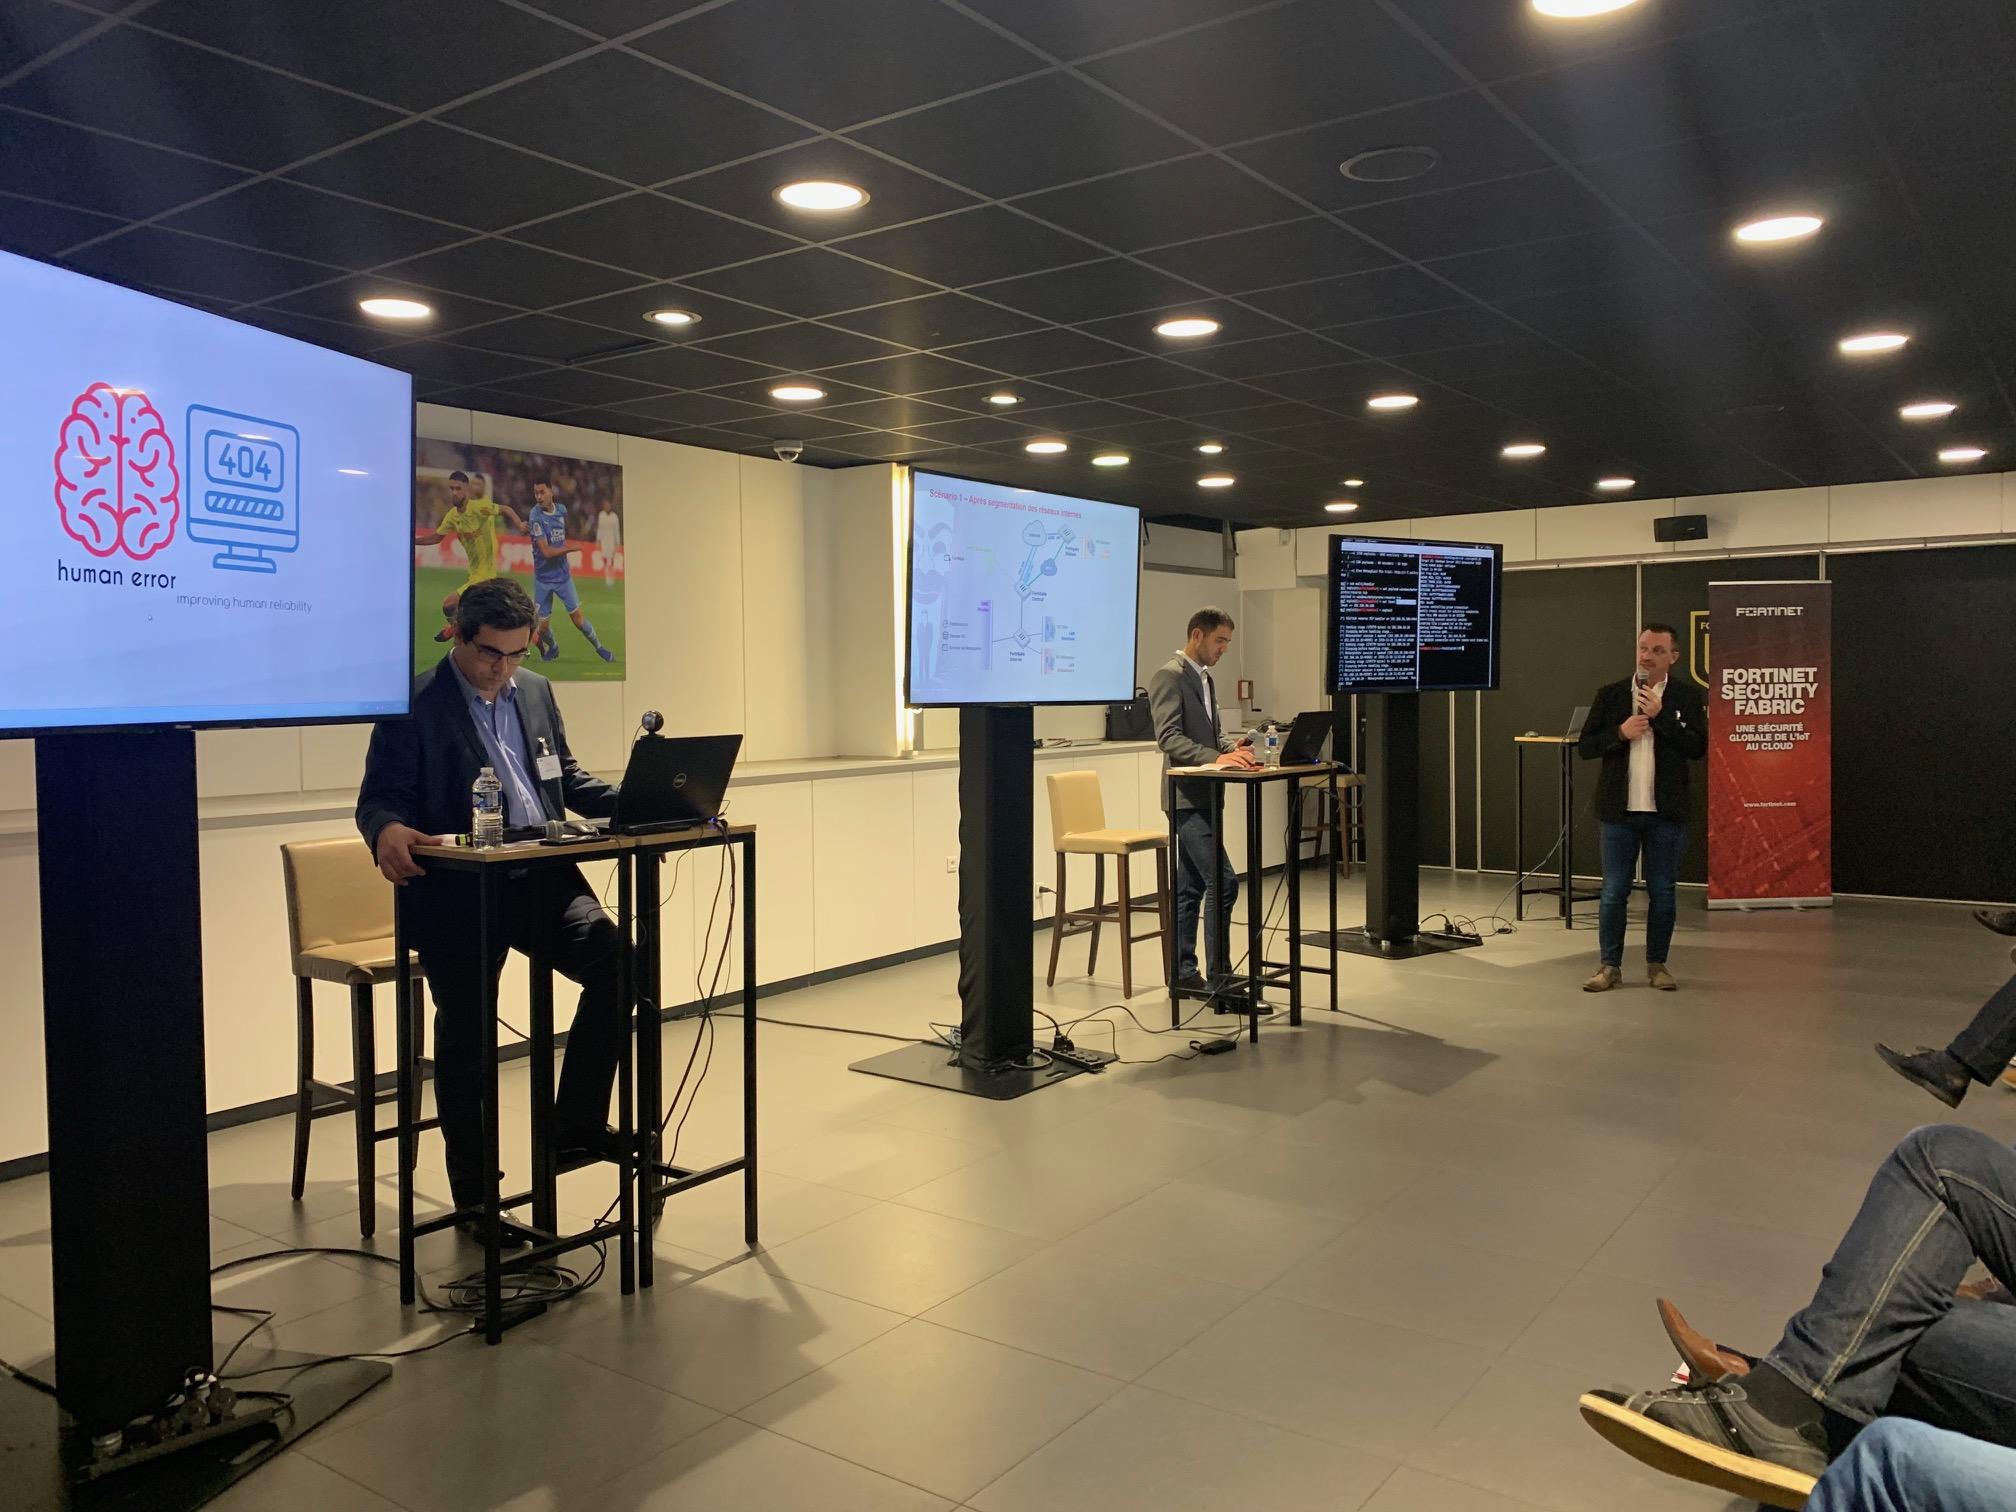 hacking lab demonstration live nantes la beaujoire 2019